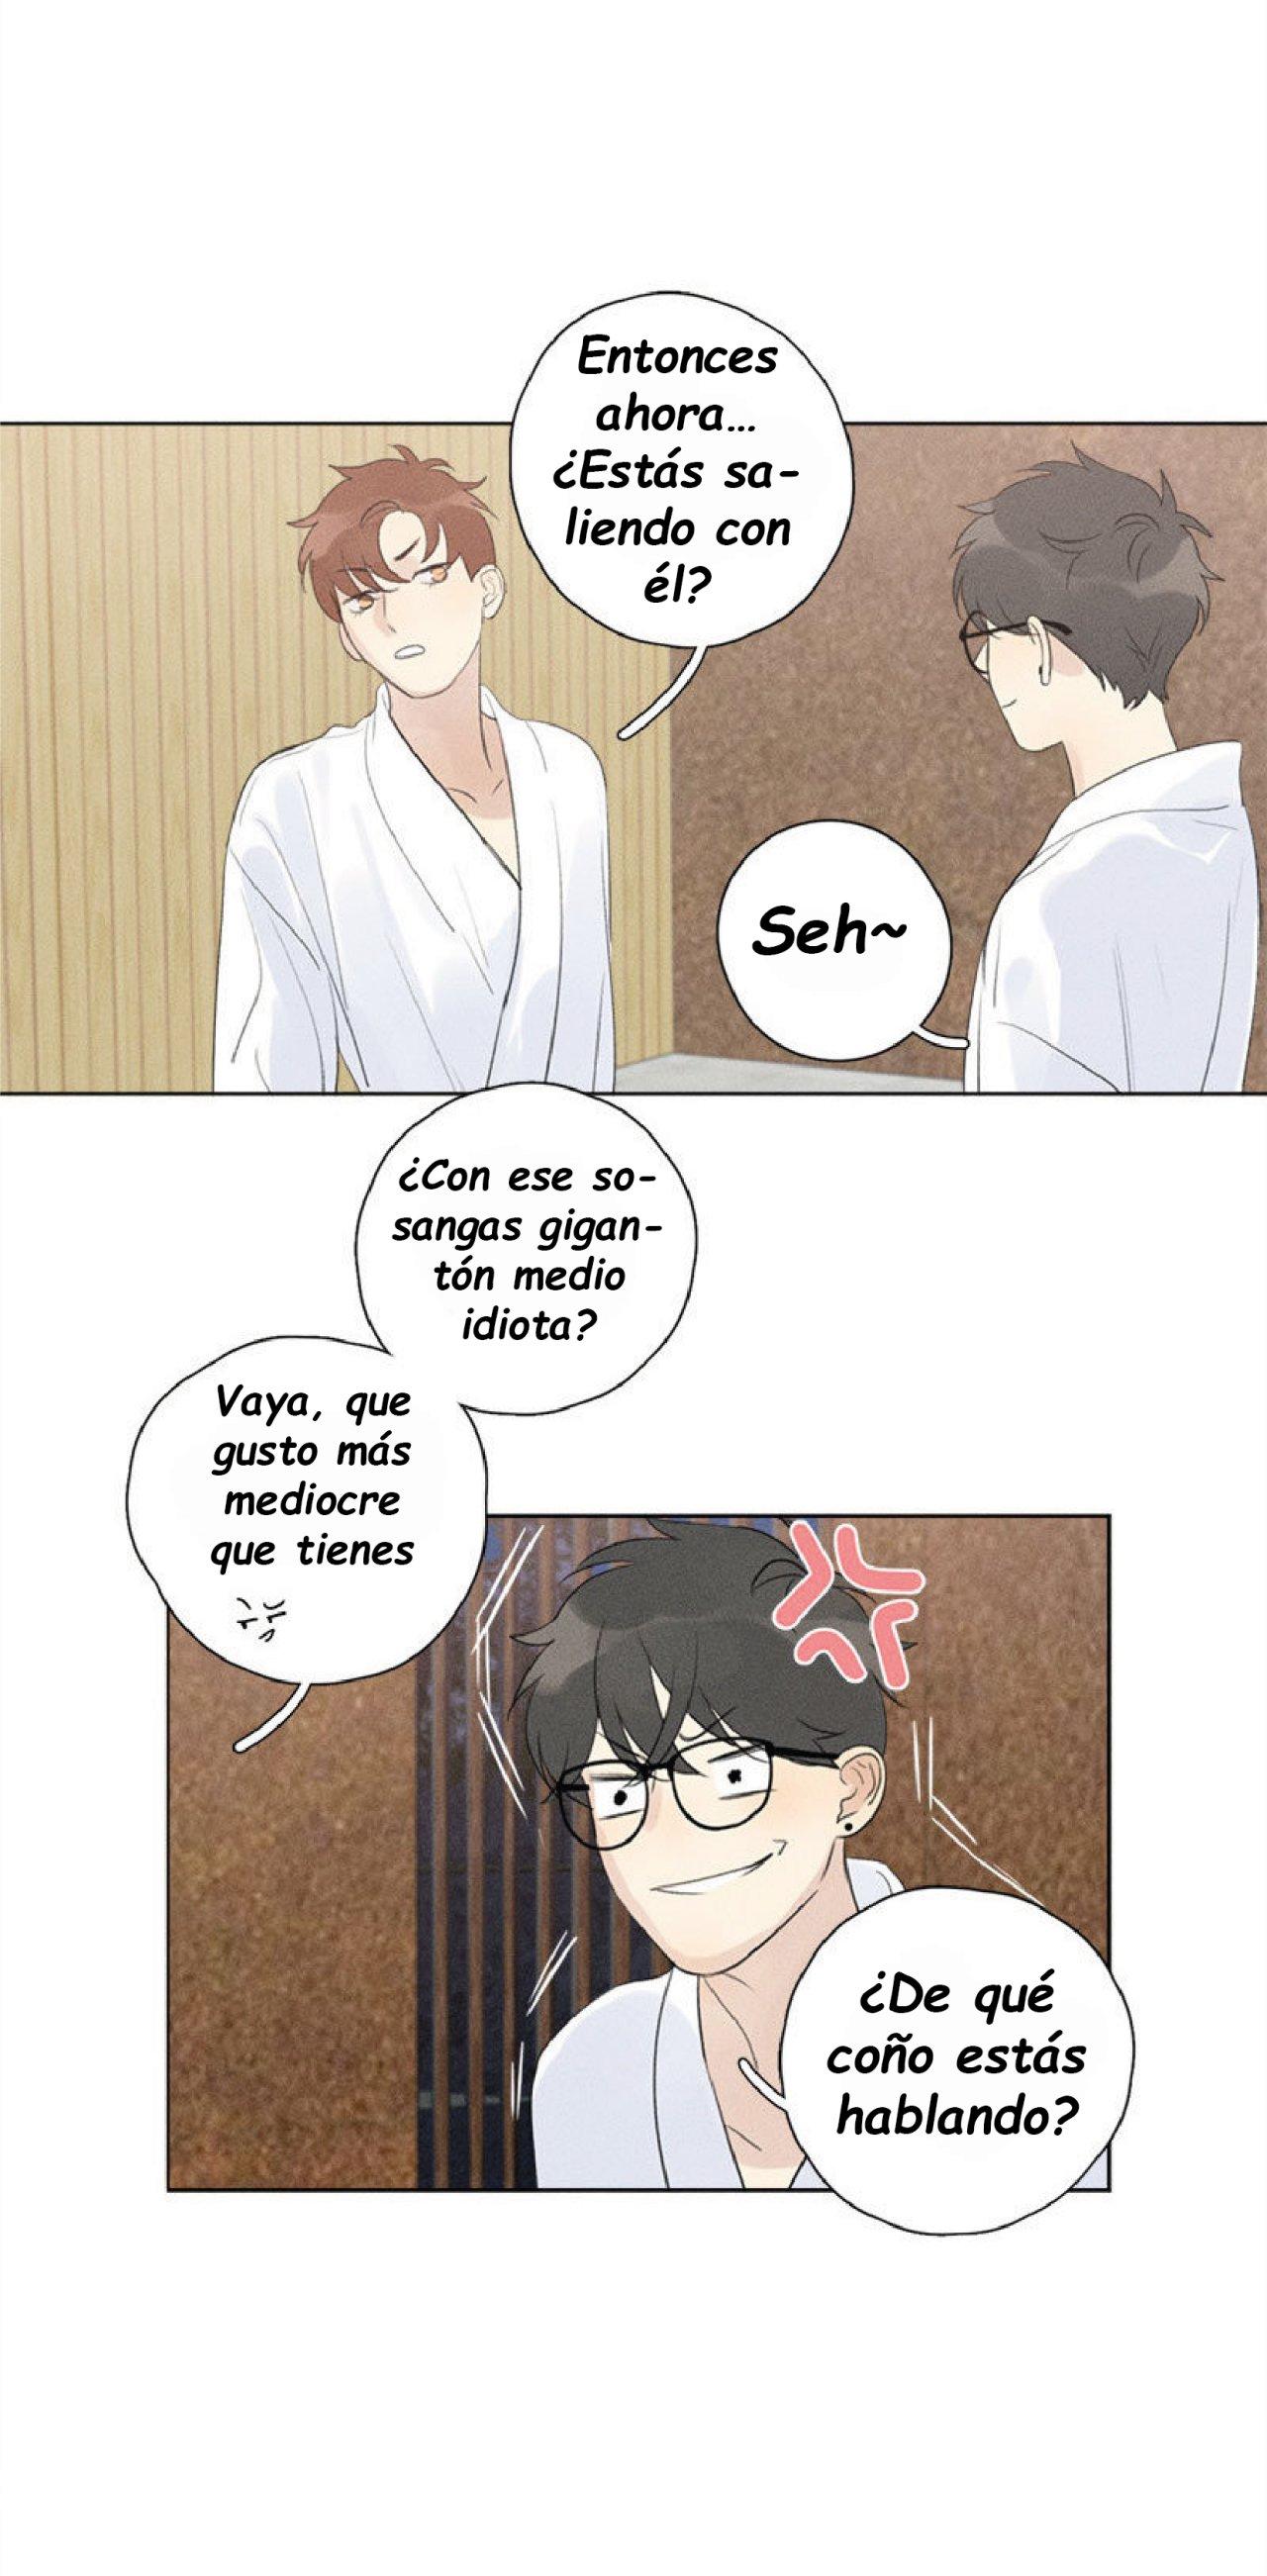 https://nine.mangadogs.com/es_manga/pic8/29/24925/946329/1c6a0198177bfcc9bd93f6aab94aad3c.jpg Page 31